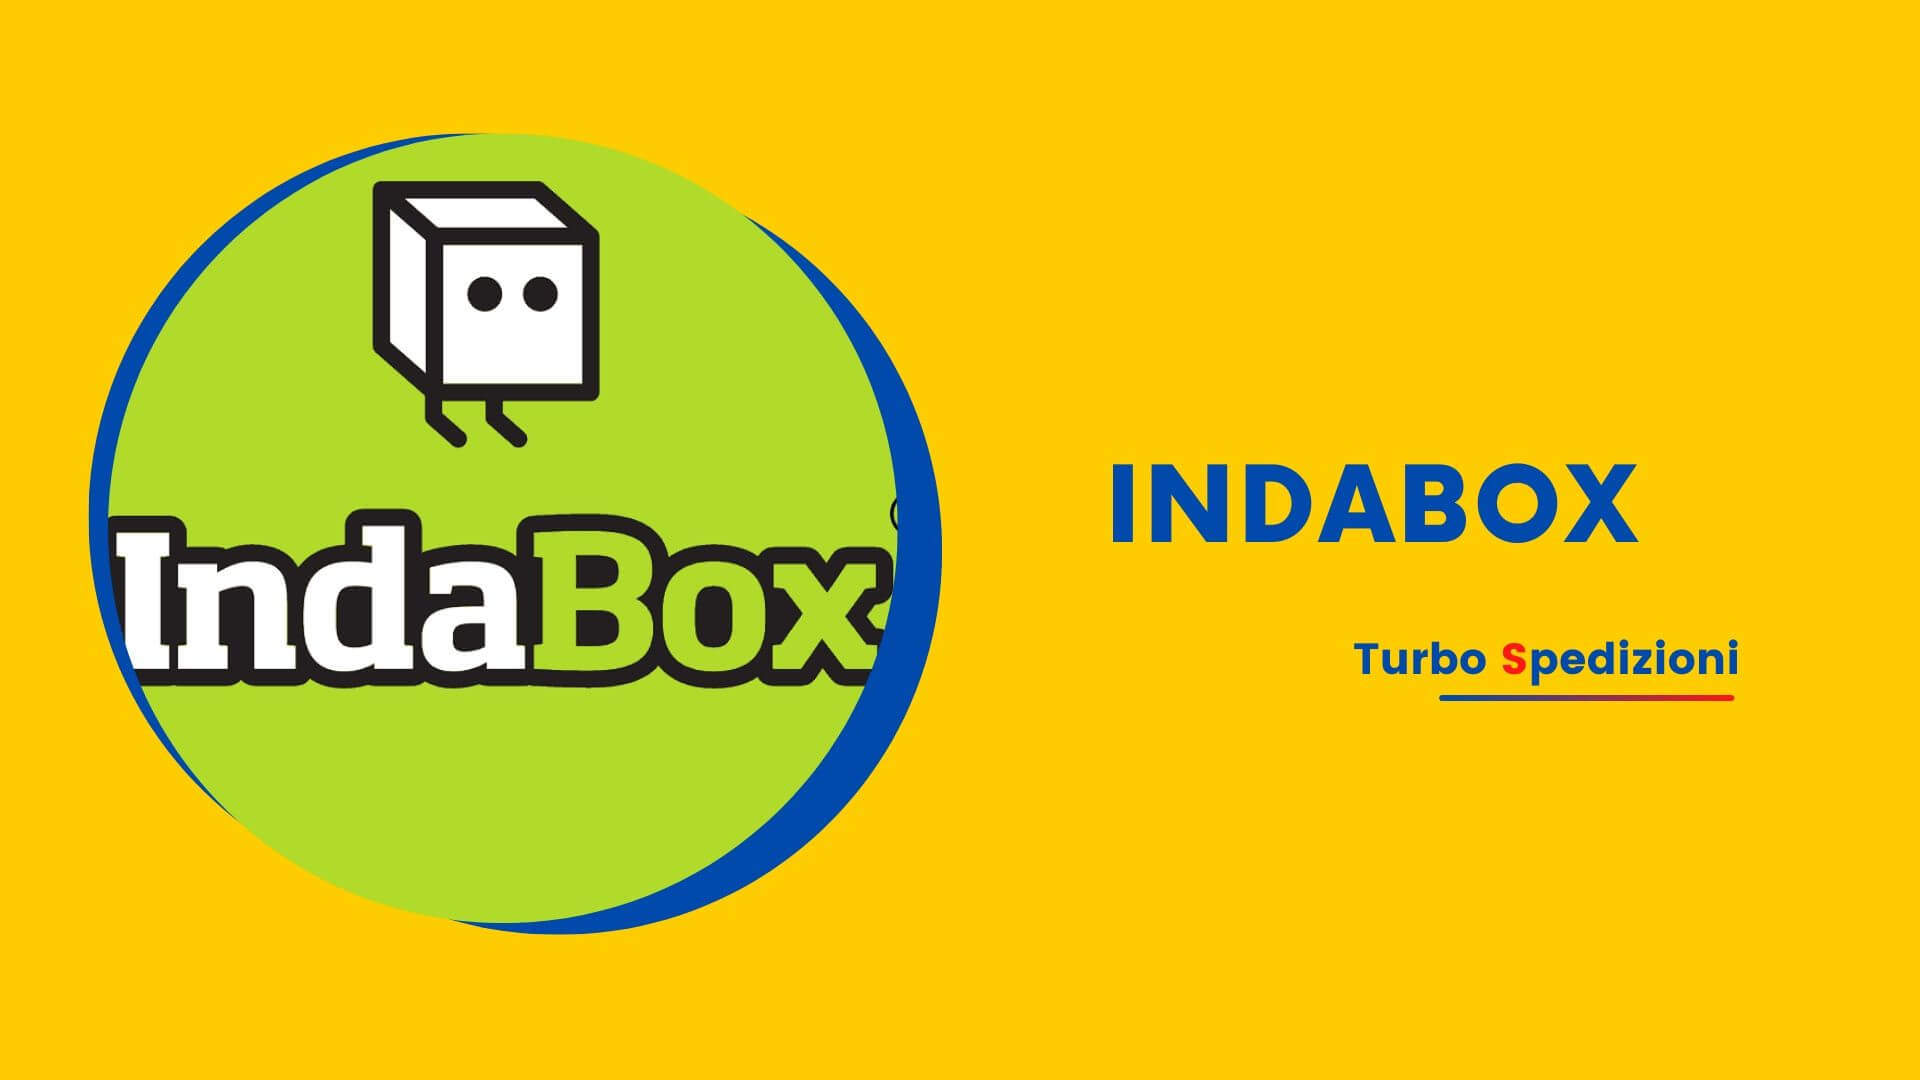 indabox - 2020